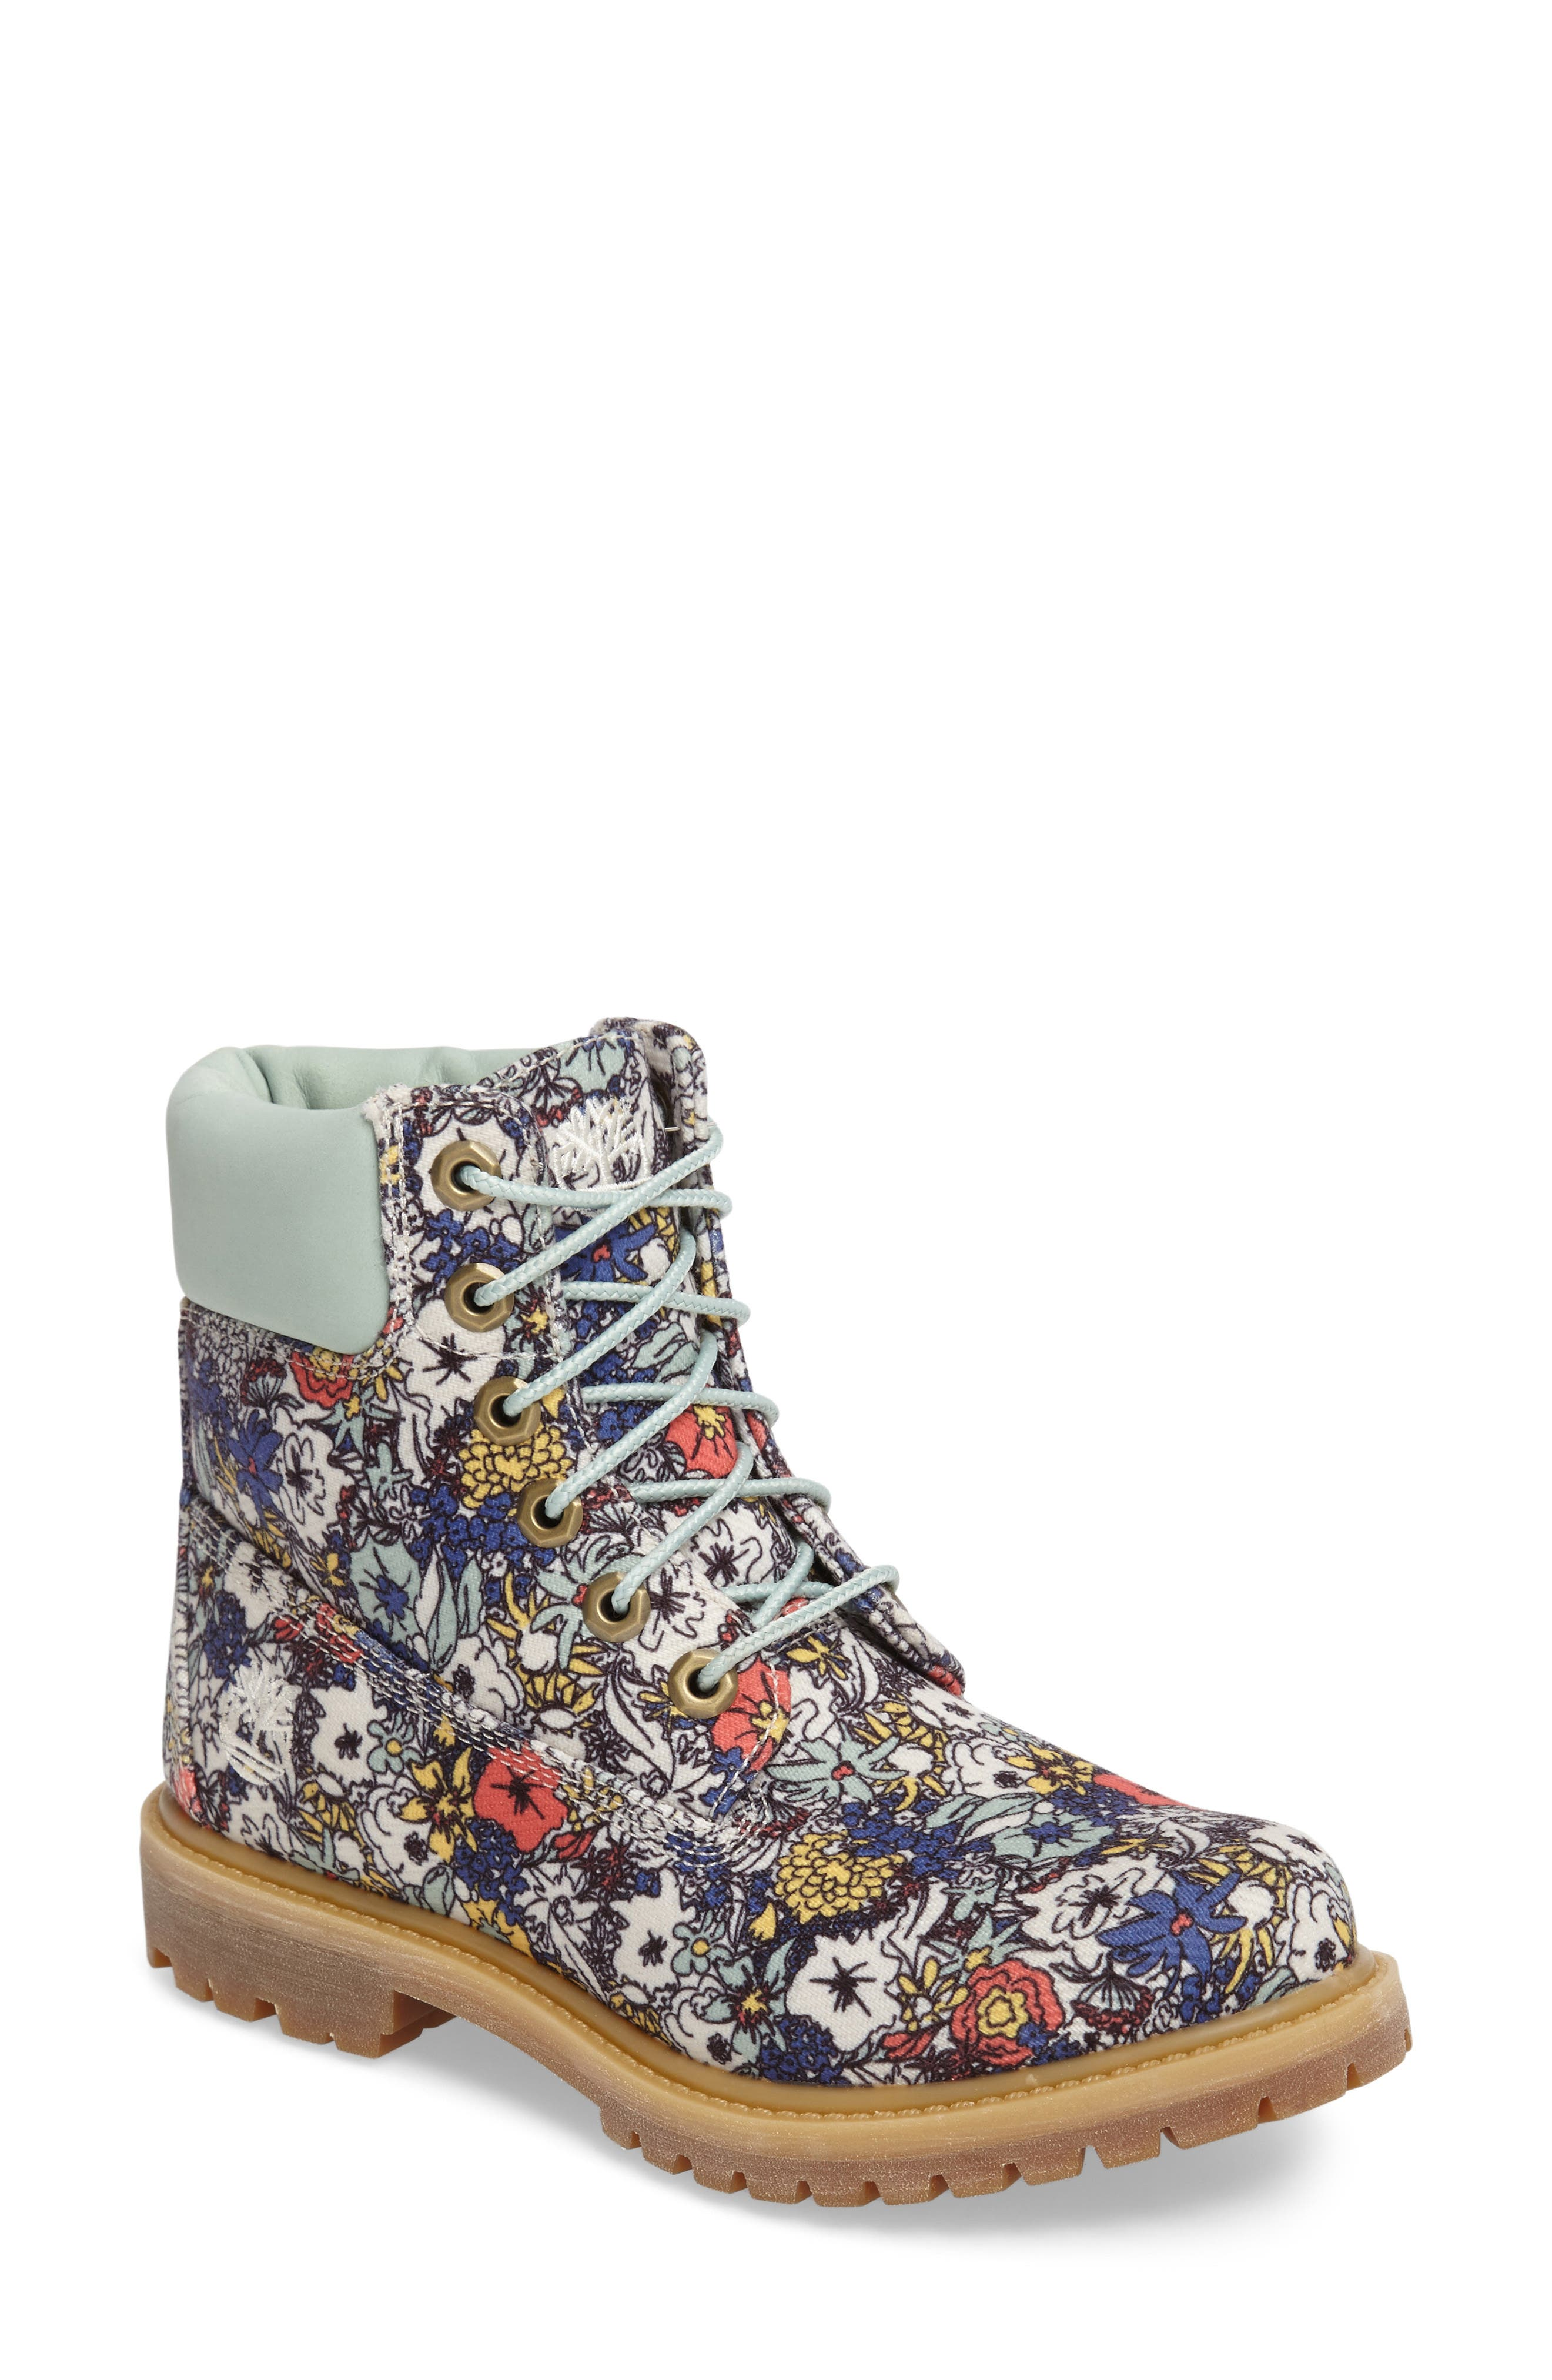 6 Inch Premium Floral Print Boot, Main, color, 400